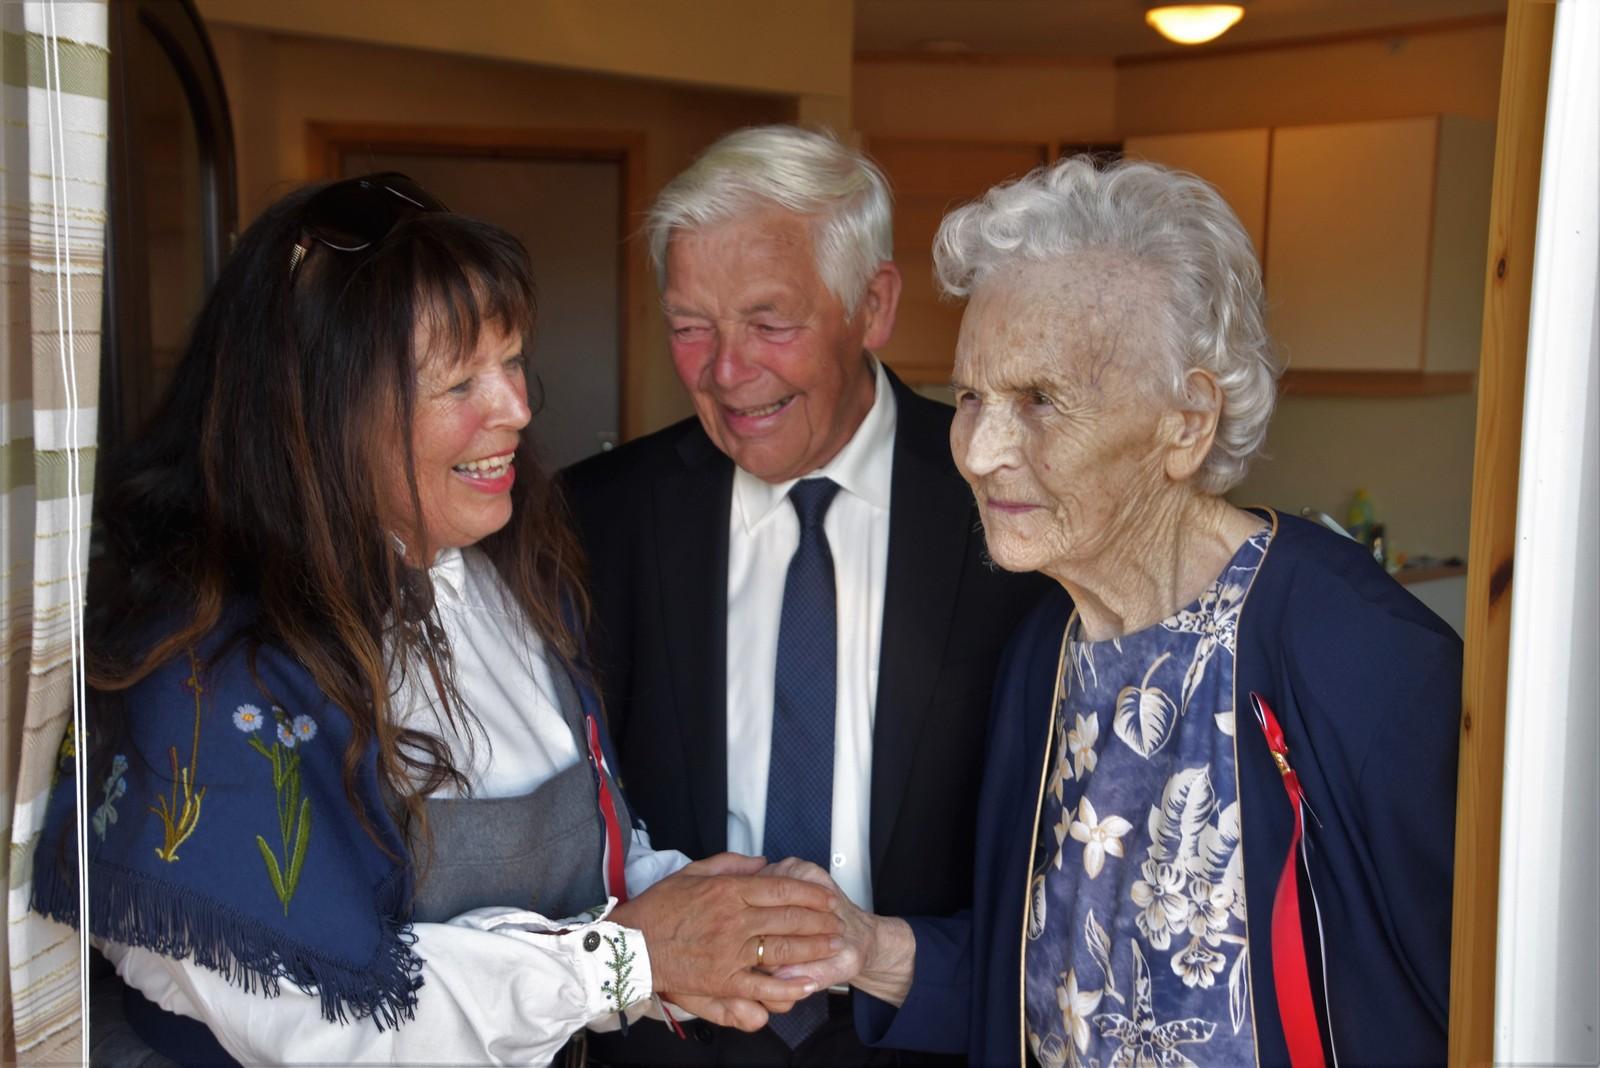 Med toget til Lundhaugen omsorgssenter i Bud kom sønnen til Borgny, Olav (83) og barnebarnet Rebekka (62).